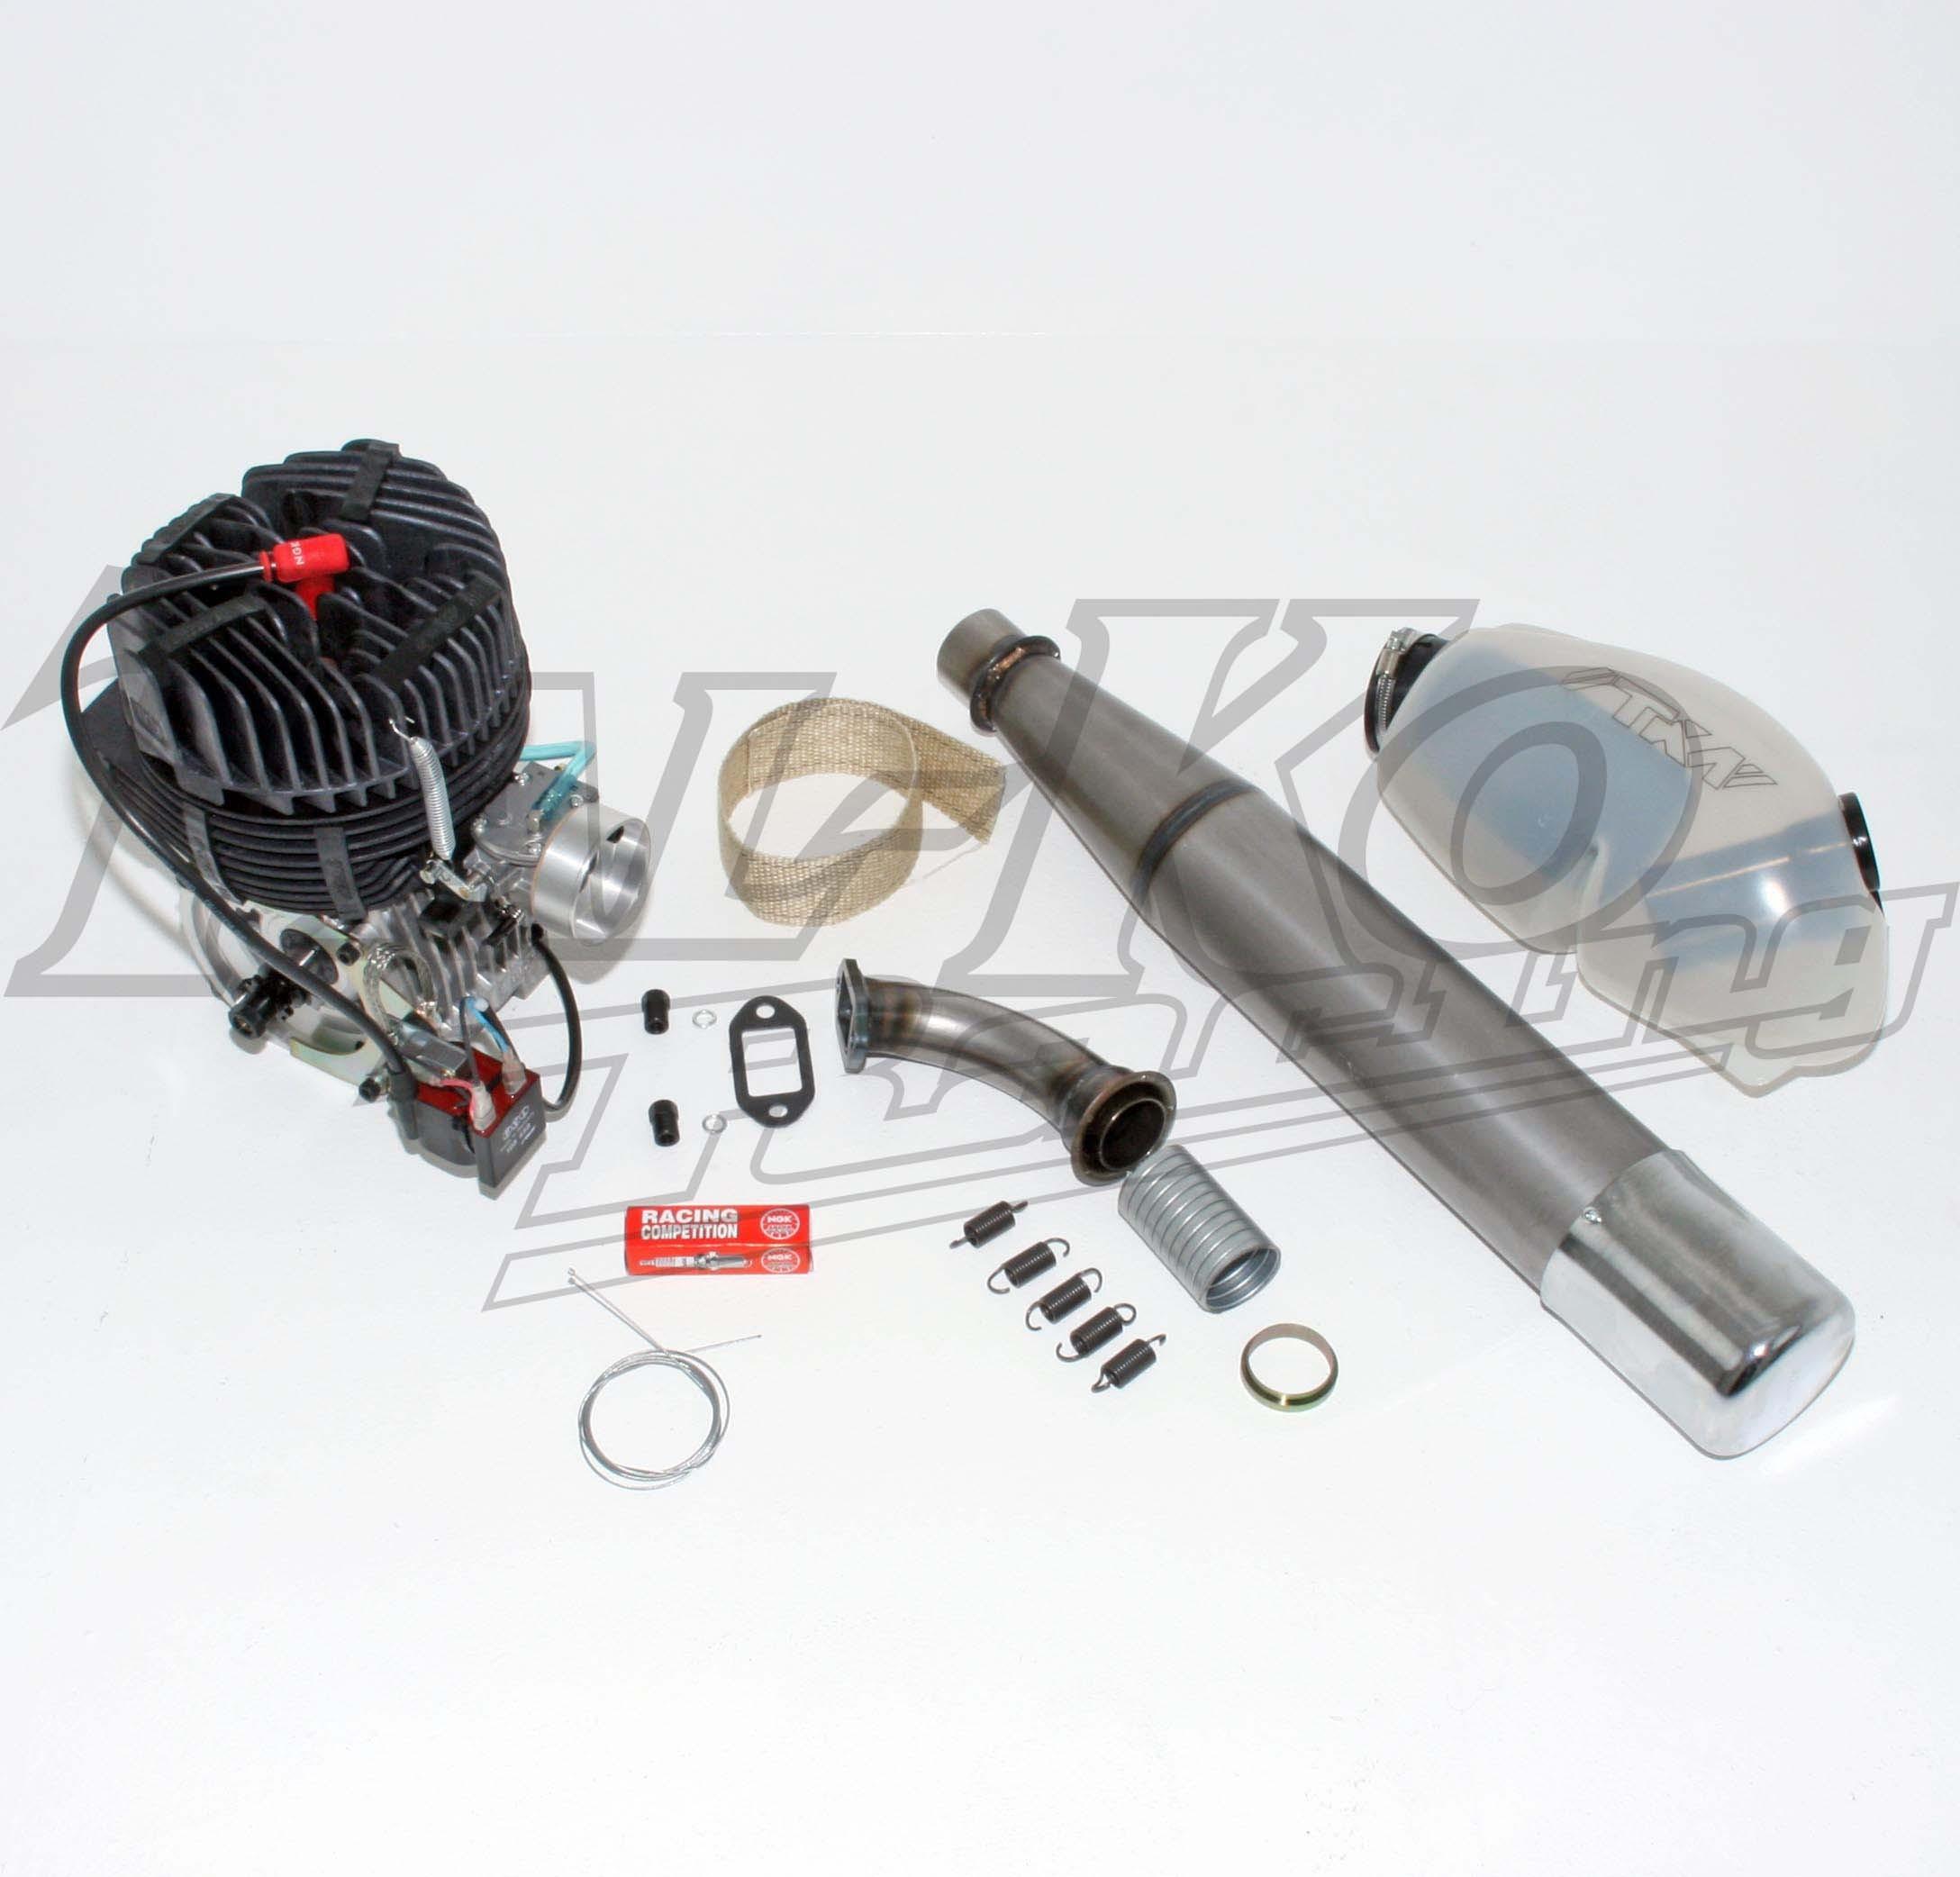 Tkm Bt82 100cc Junior Engine Direct Drive